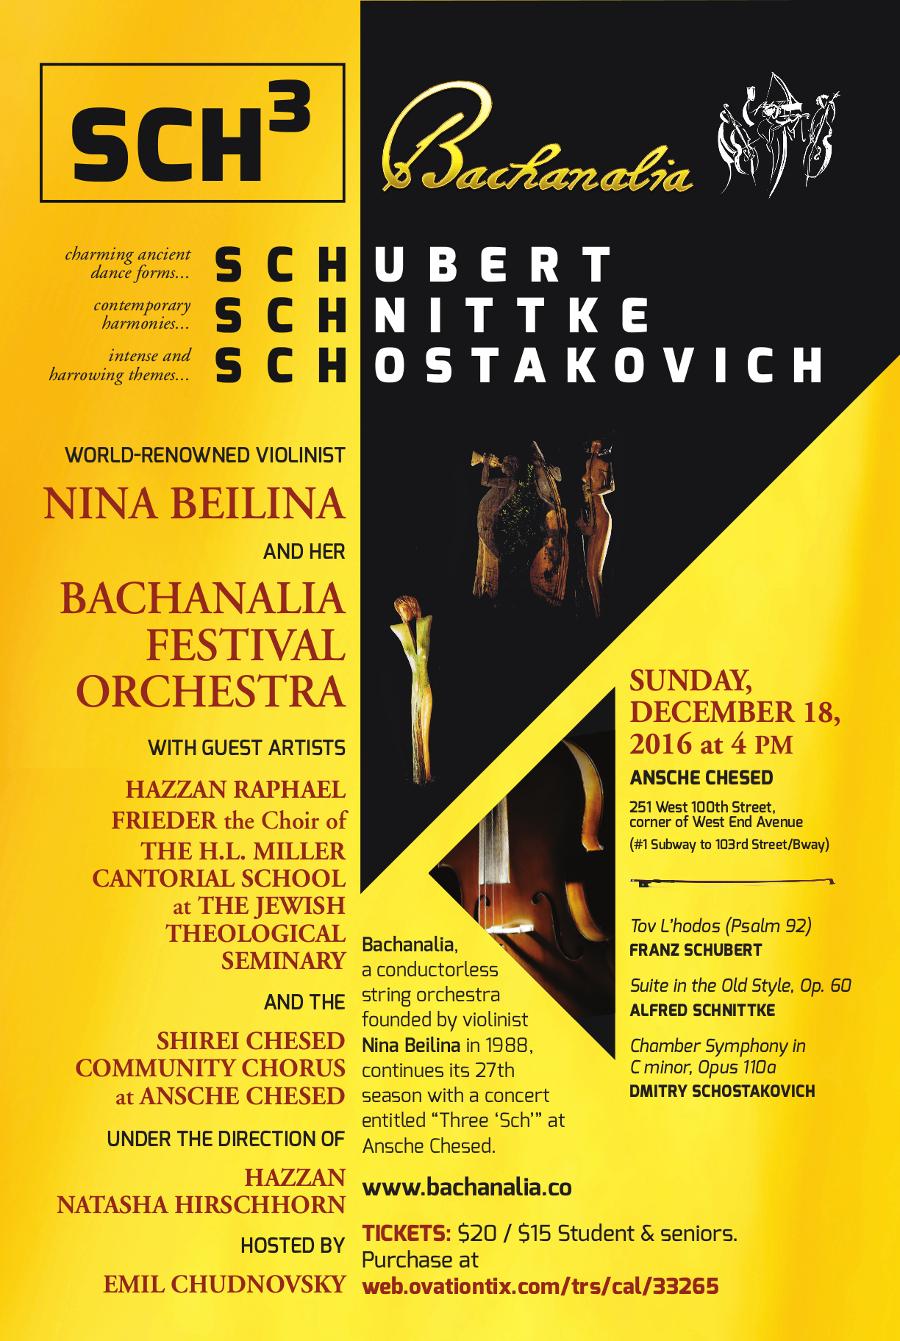 Art Strings director Alexander Abayev is a  concertmaster of Bachanalia